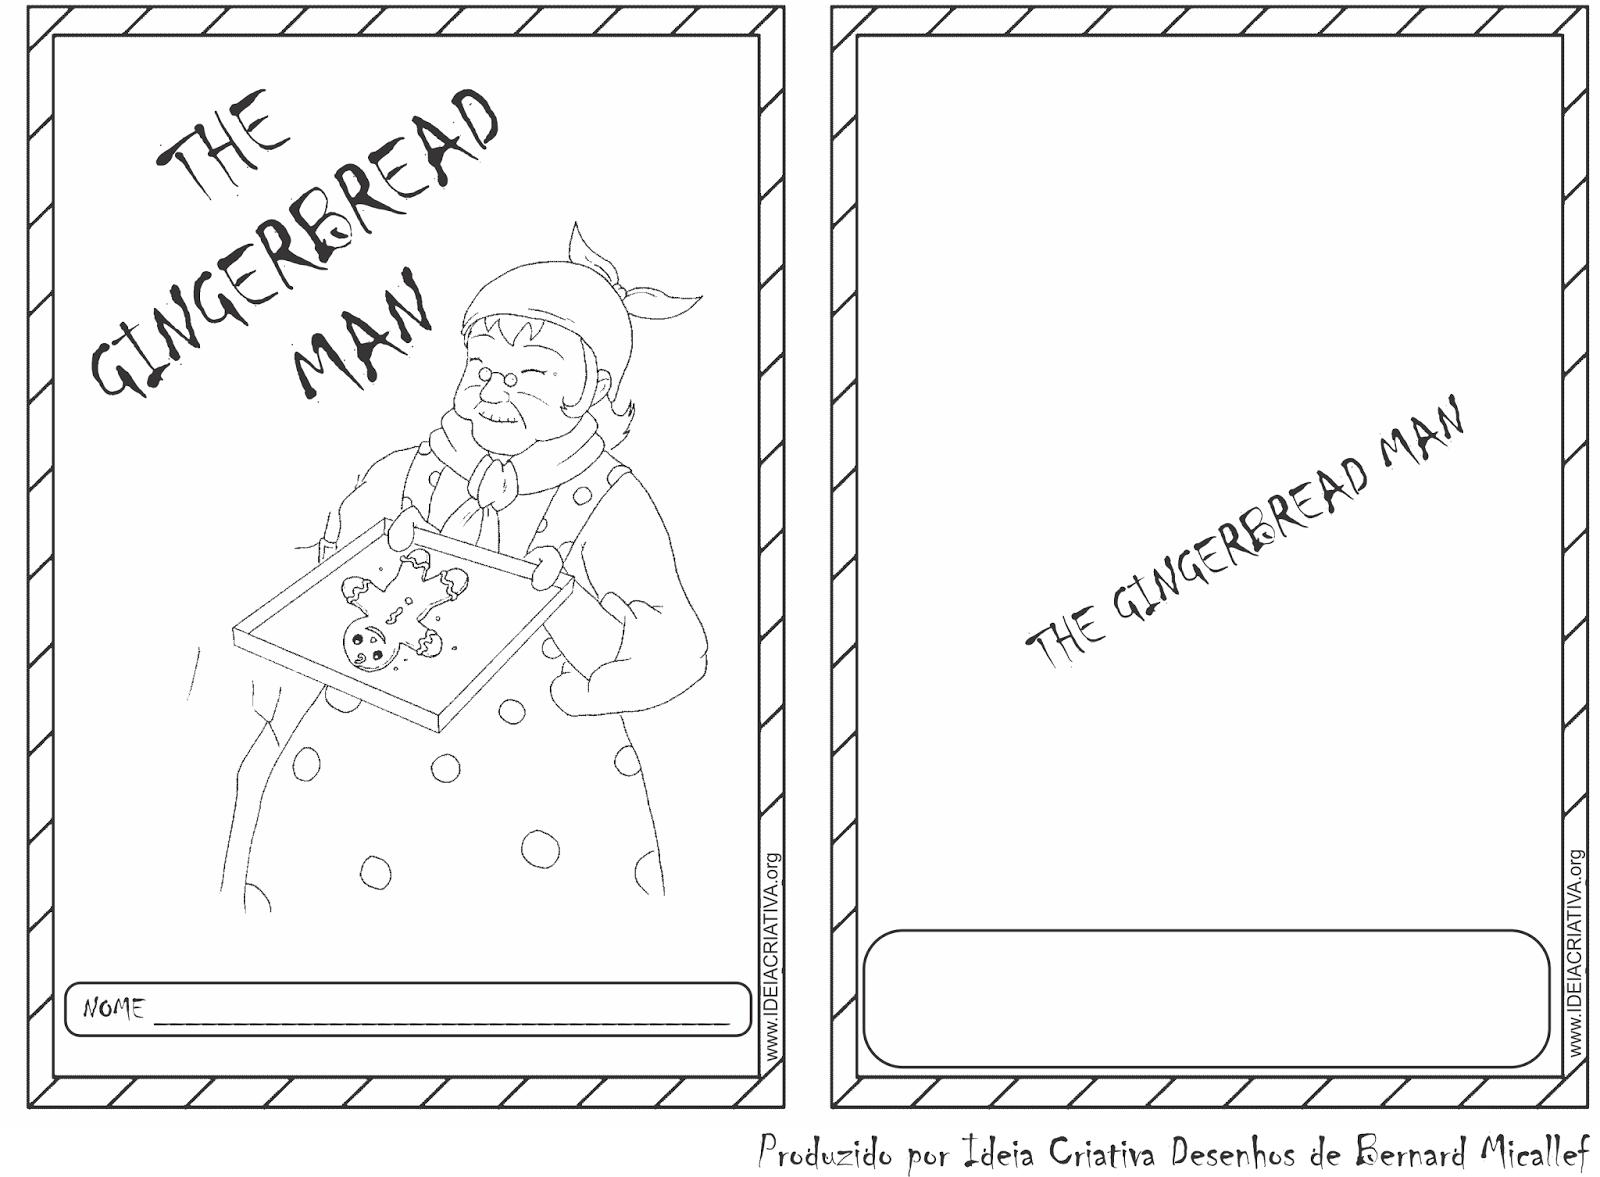 História The Ginger Bread Man para Colorir e Produzir Texto